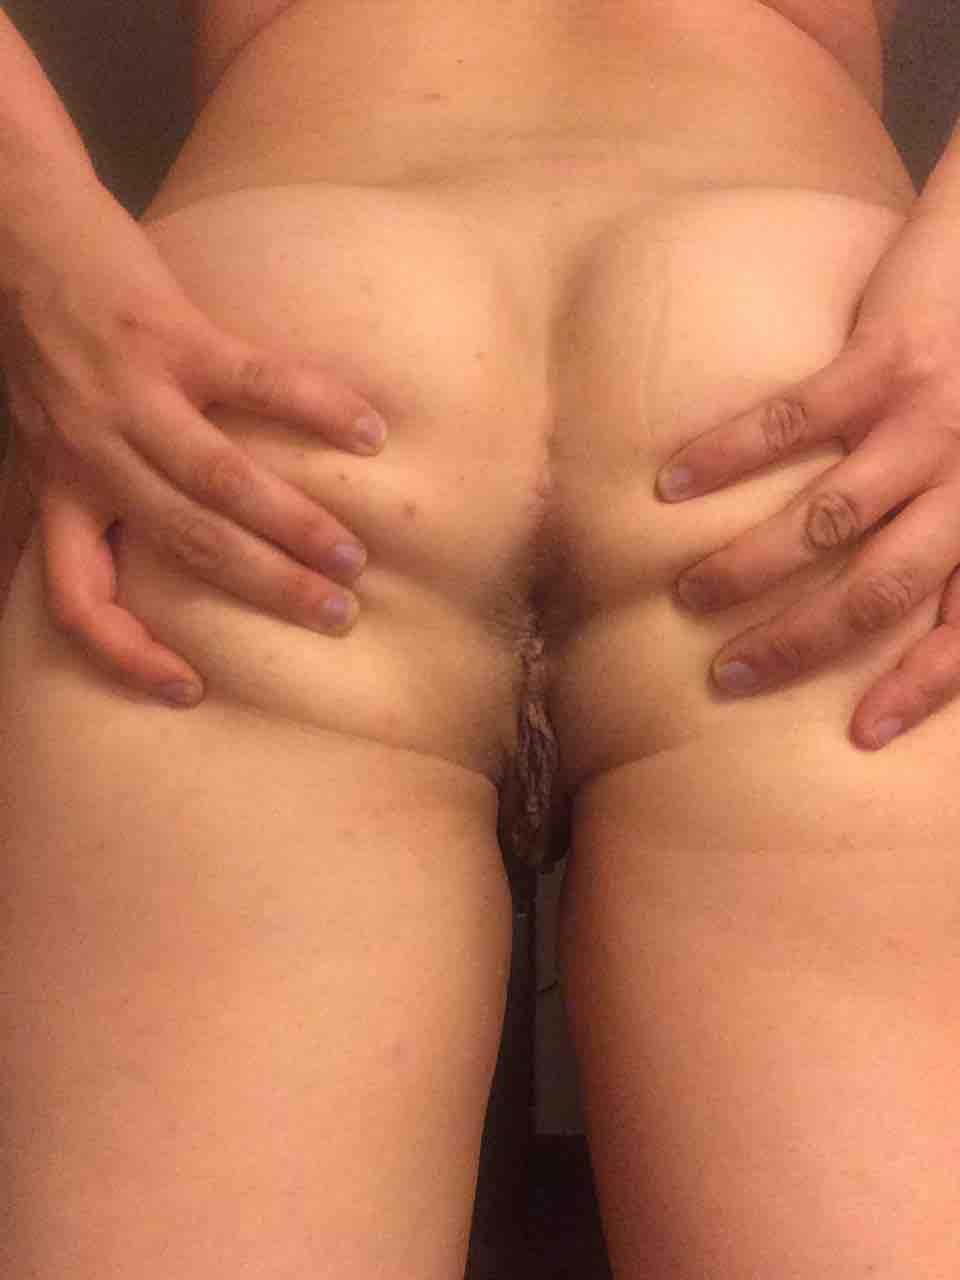 Adult Film Porno sexy adult film porn pic - eporner